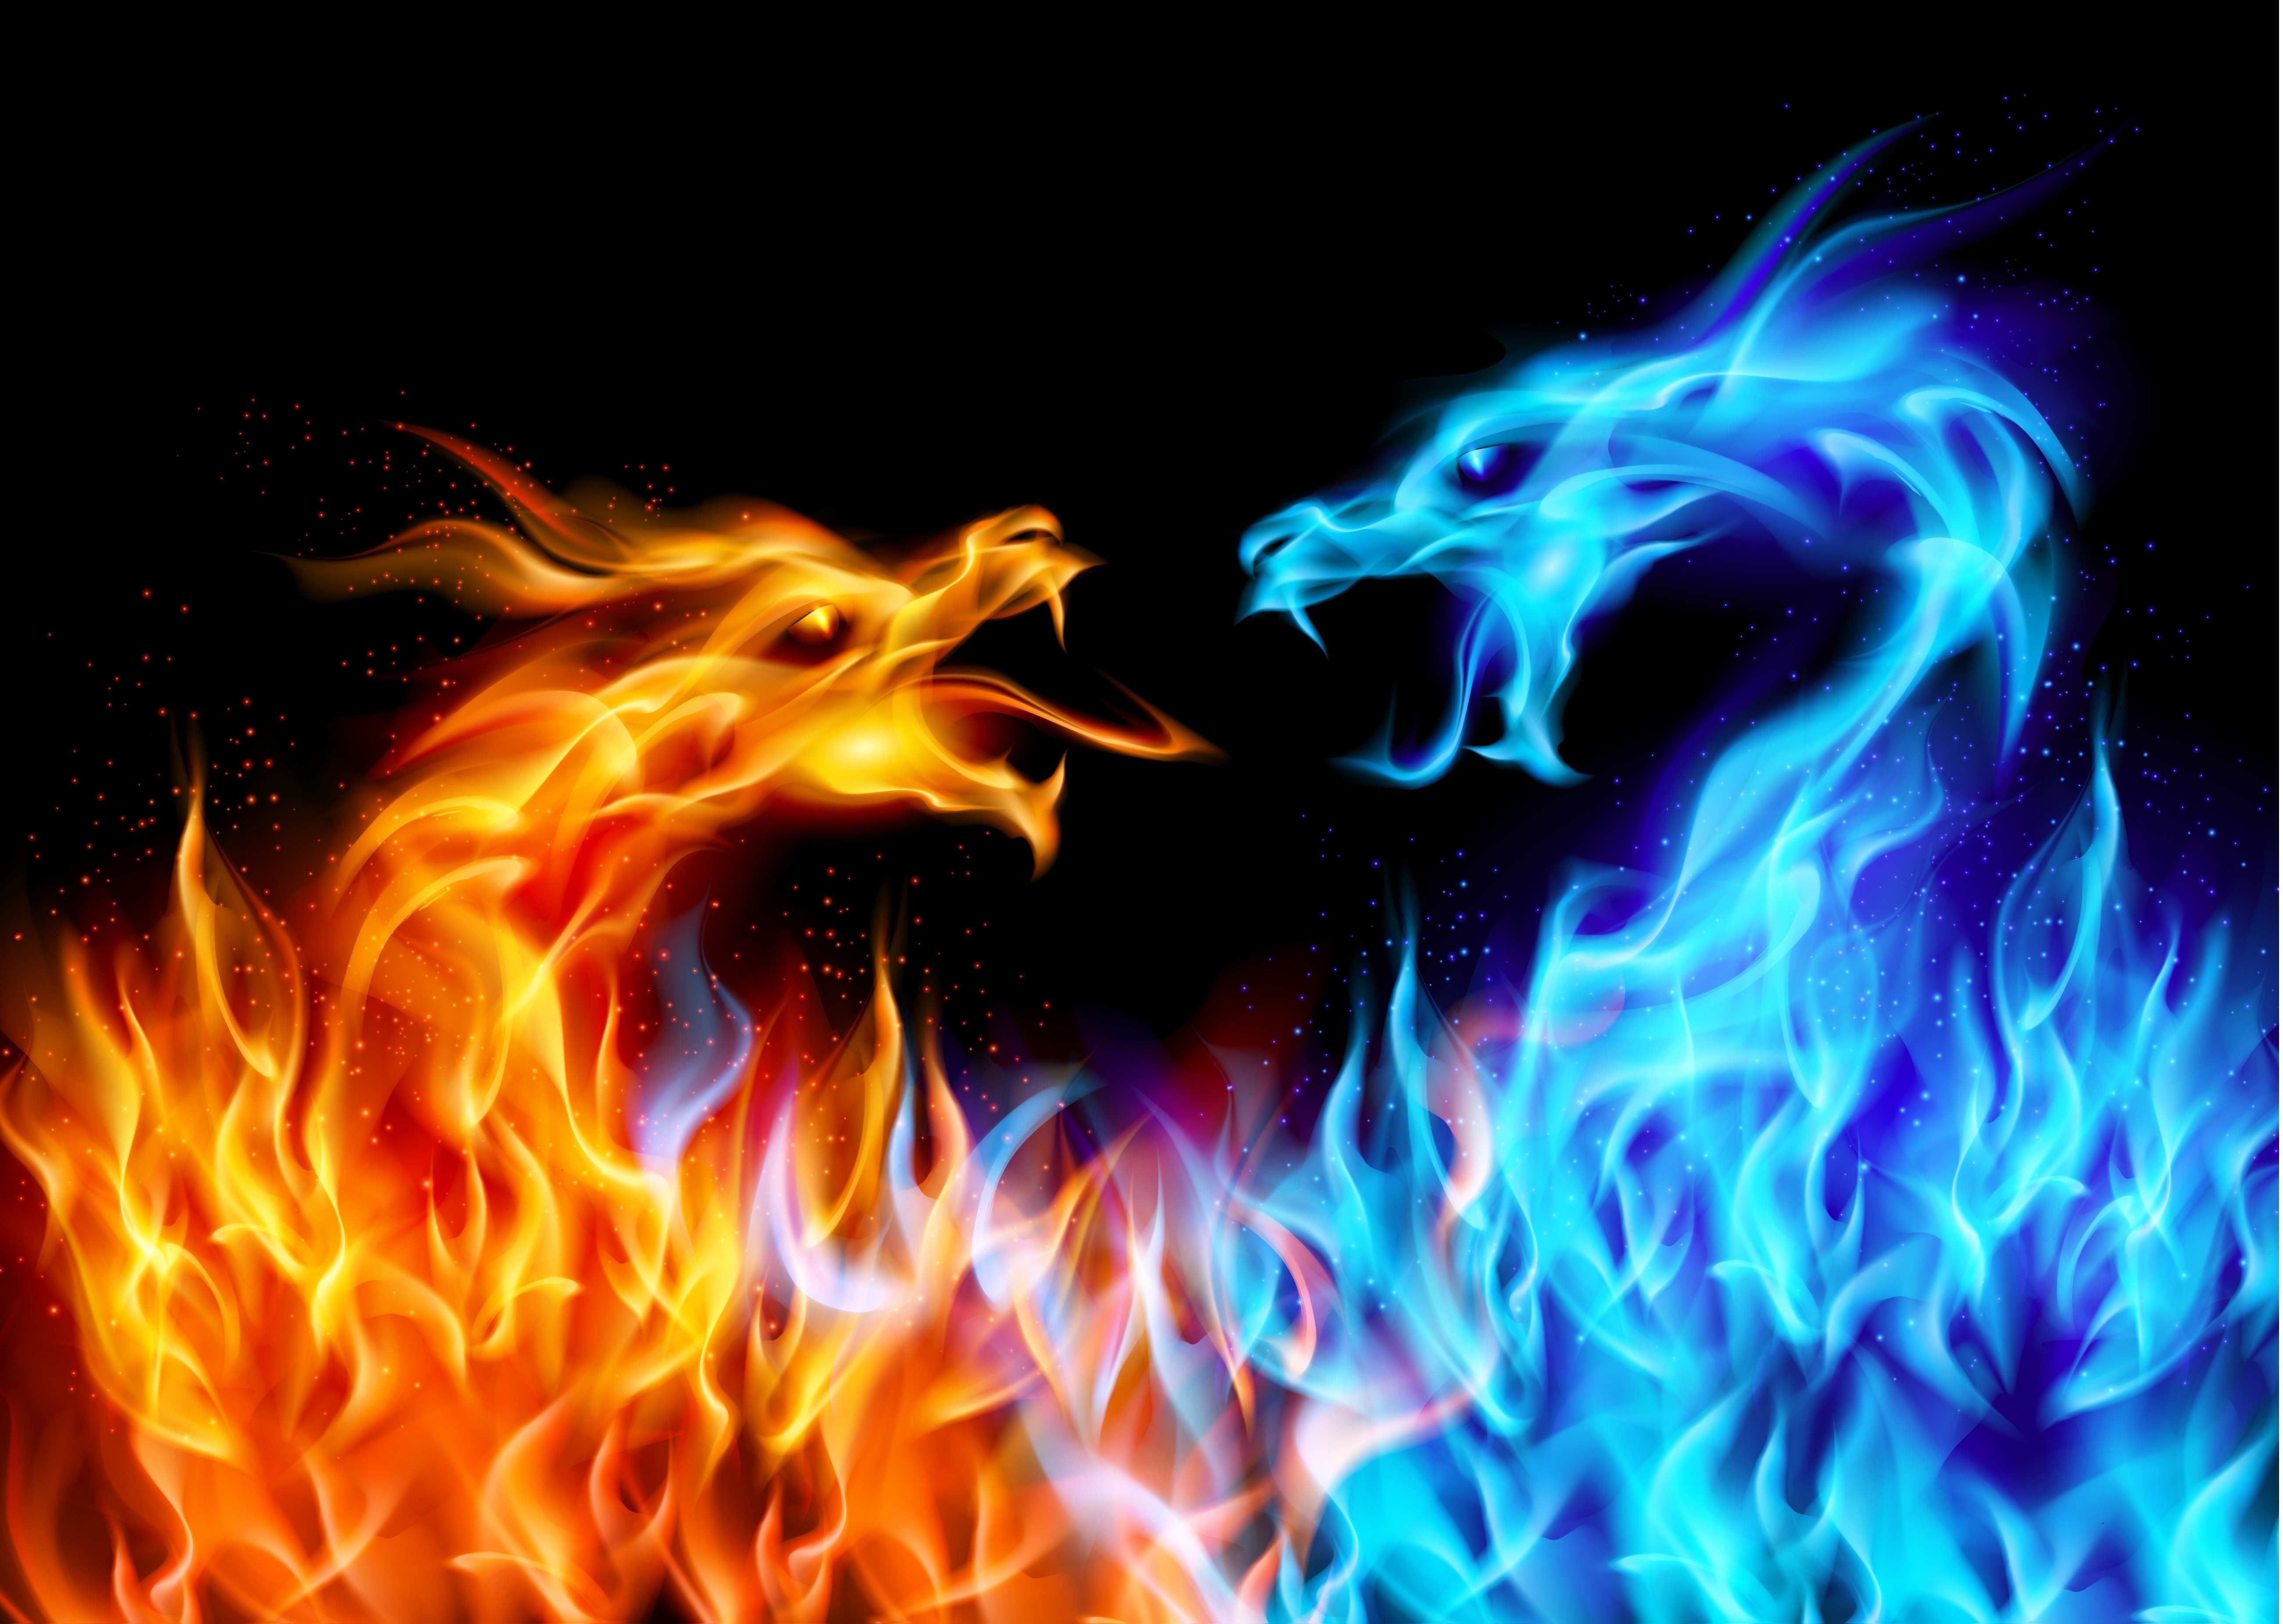 Red And Blue Dragon Fire Digital Wallpaper Dragon 5k Wallpaper Hdwallpaper Desktop Dragon Illustration Fire Dragon Fiery Dragon